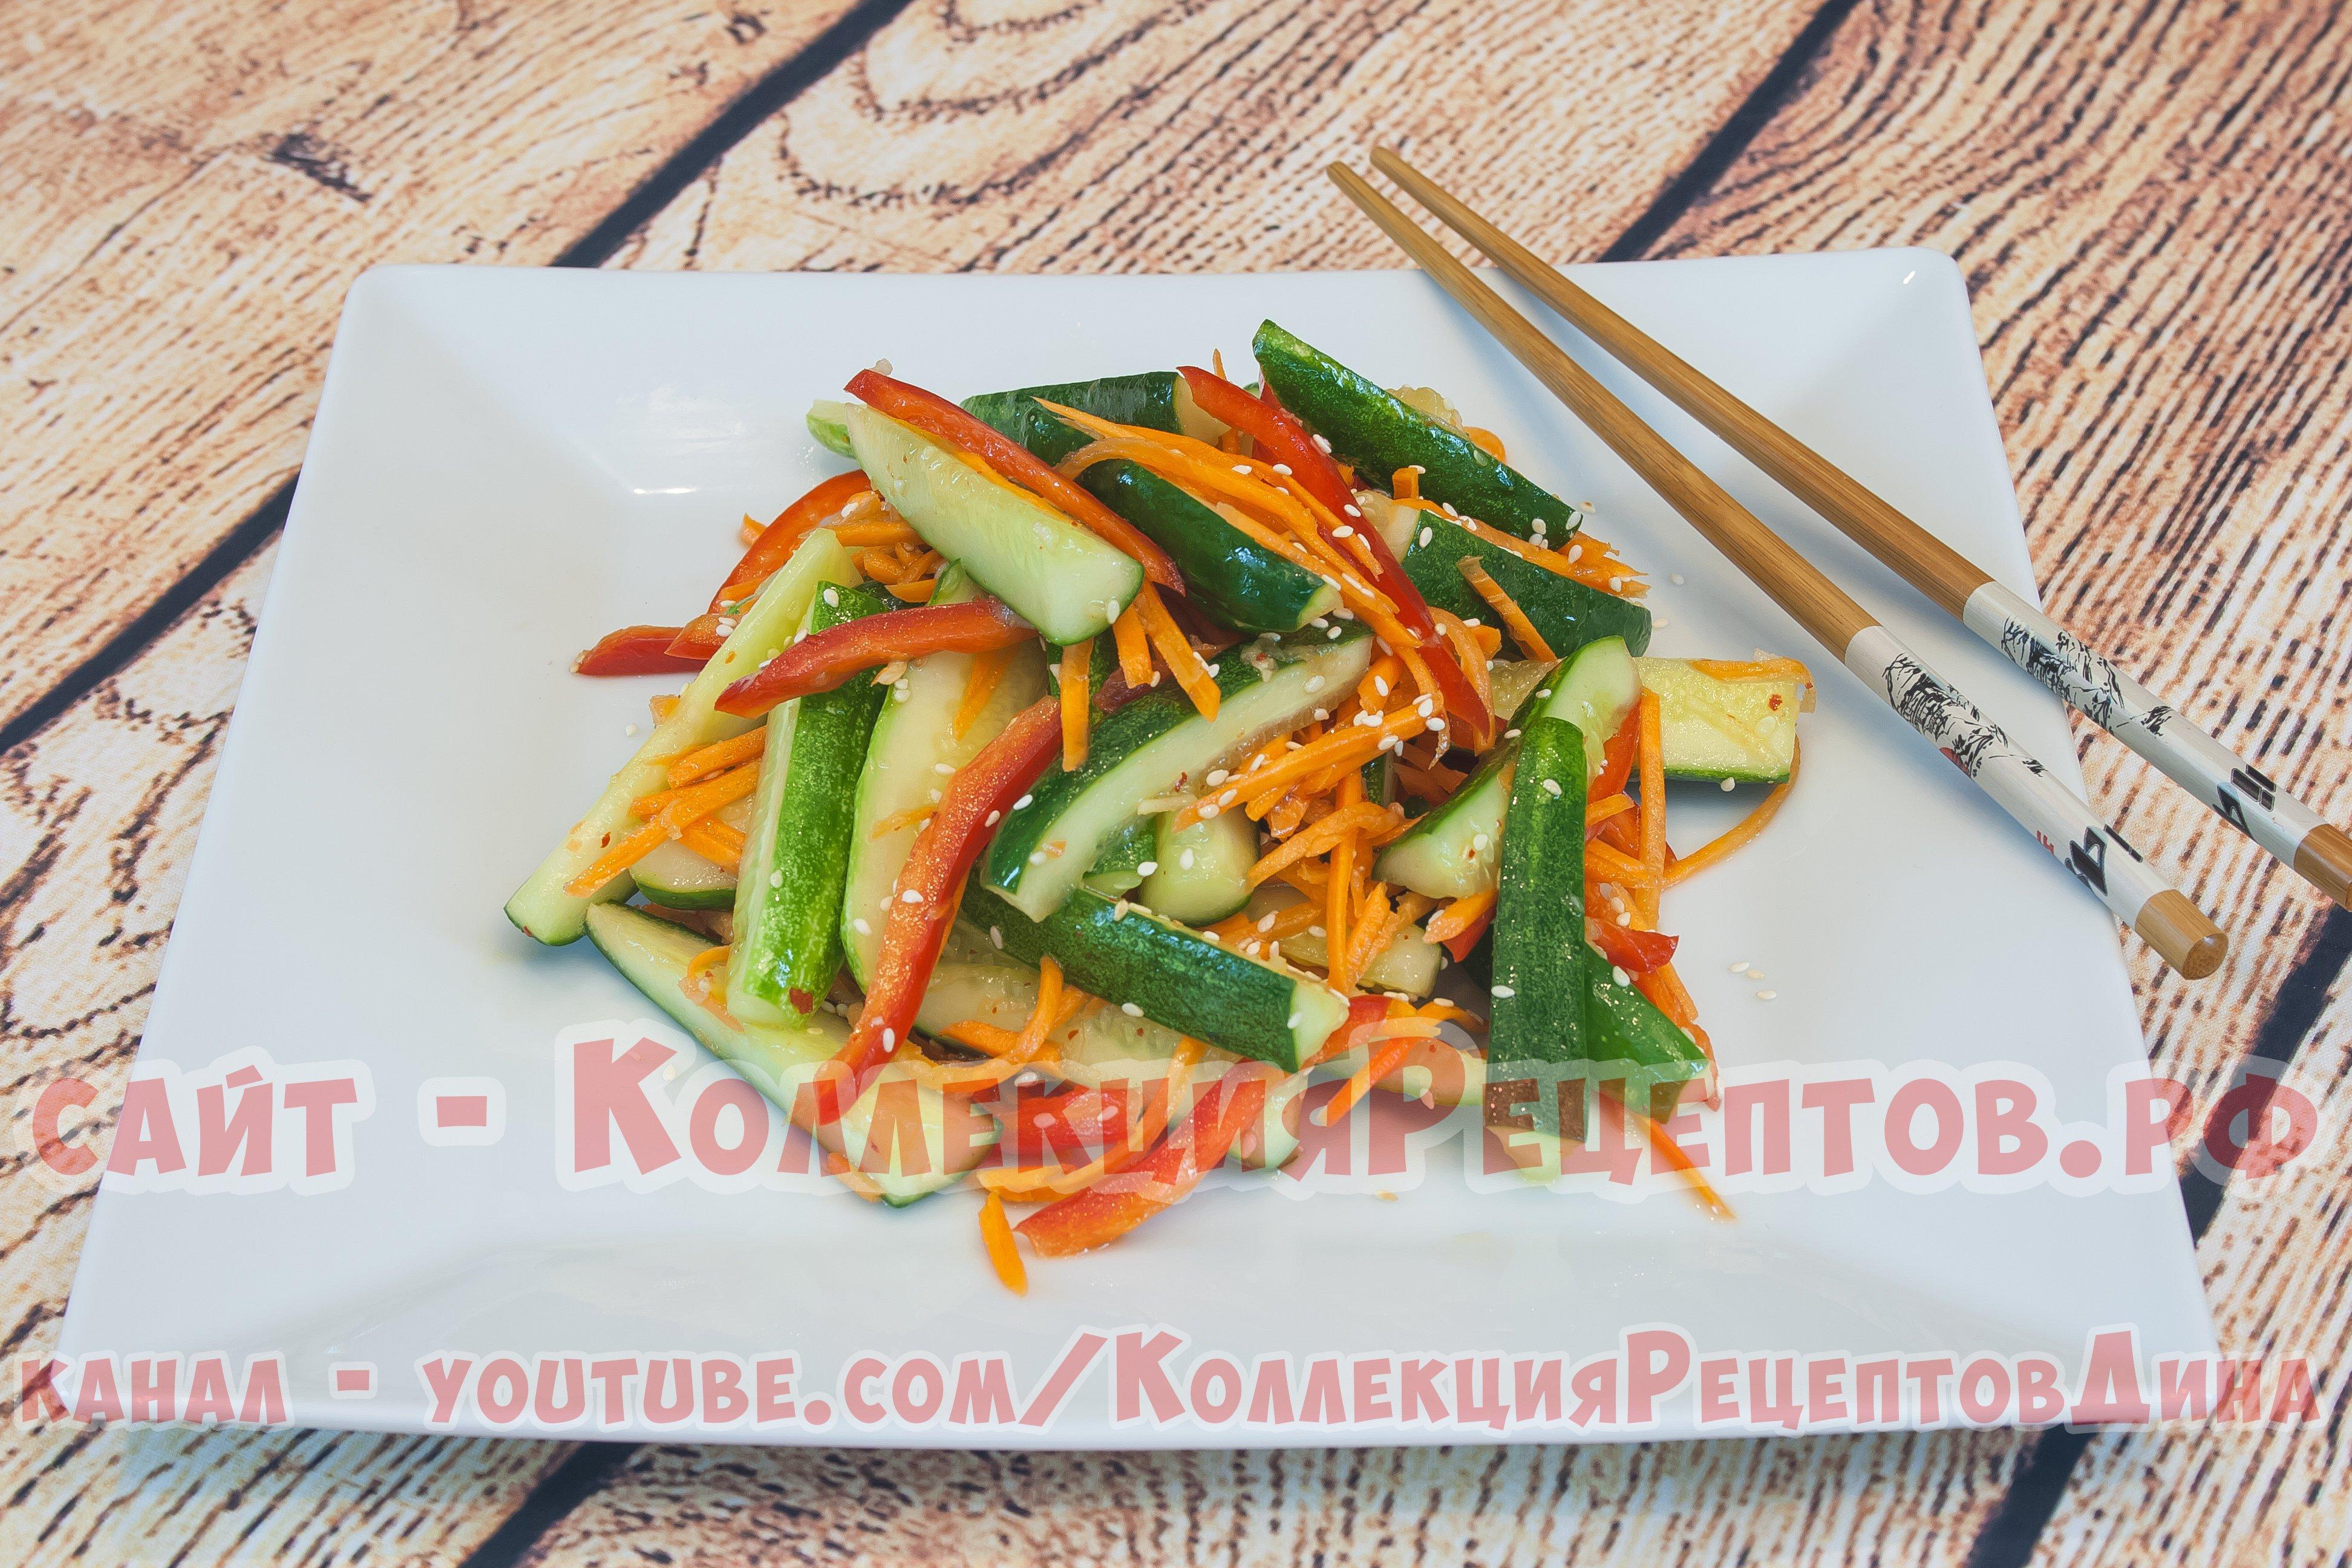 Огурцы с морковкой по-корейски рецепт